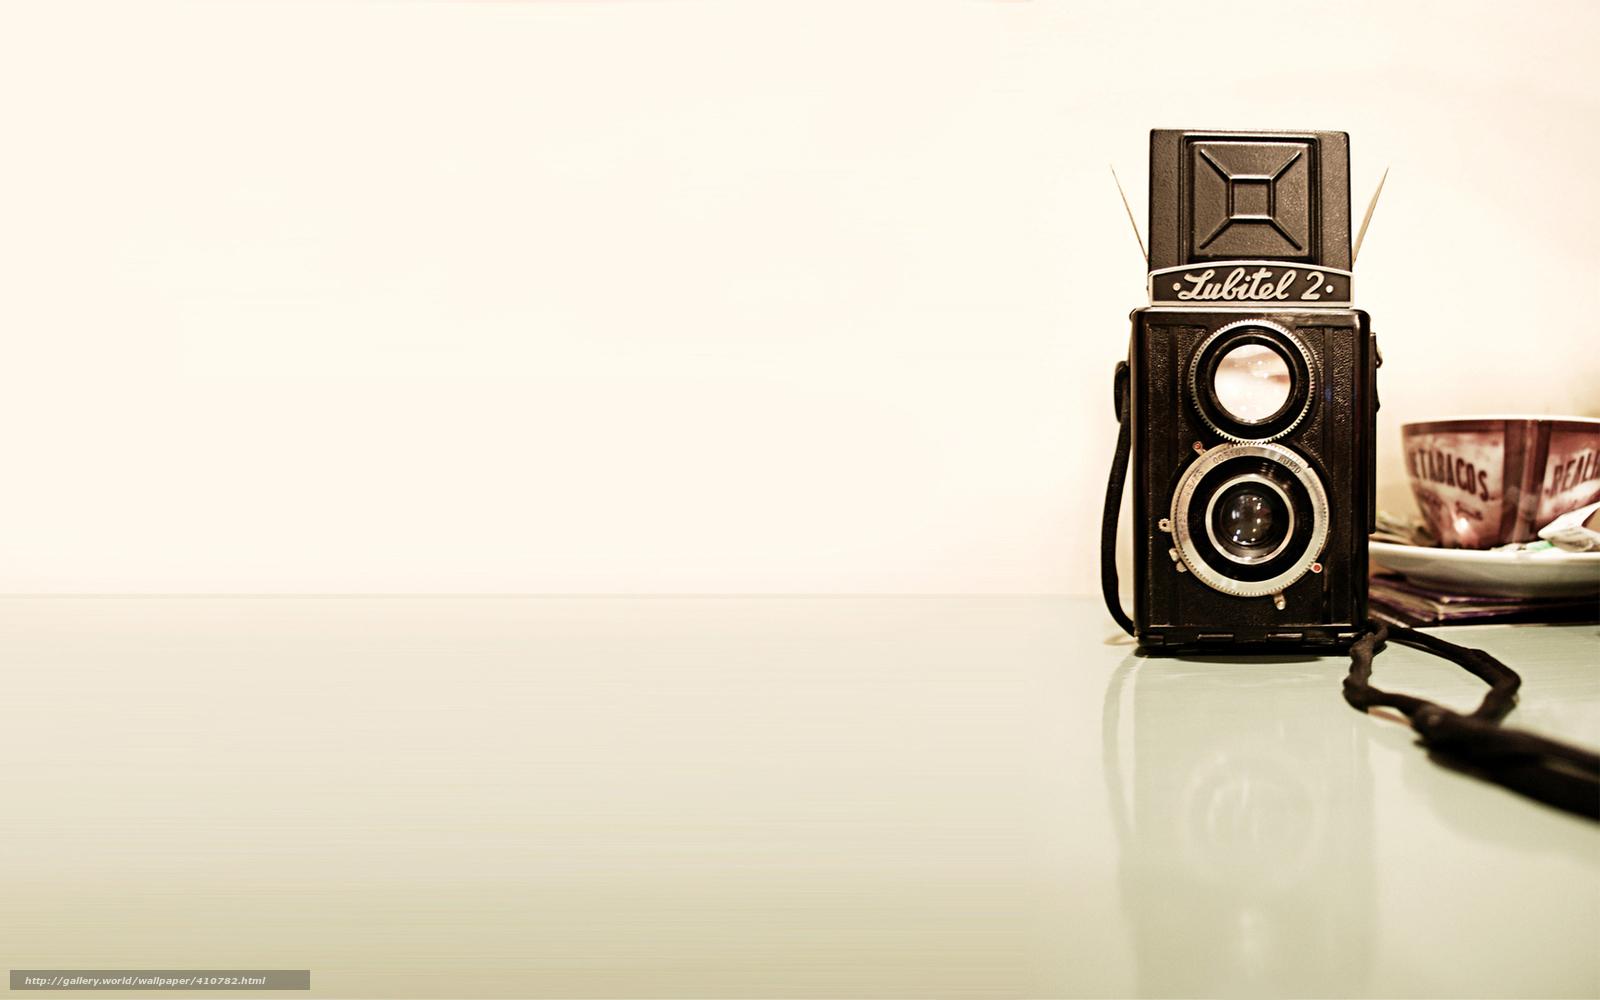 Tlcharger fond d 39 ecran appareil photo tasse amant fonds for Ecran appareil photo